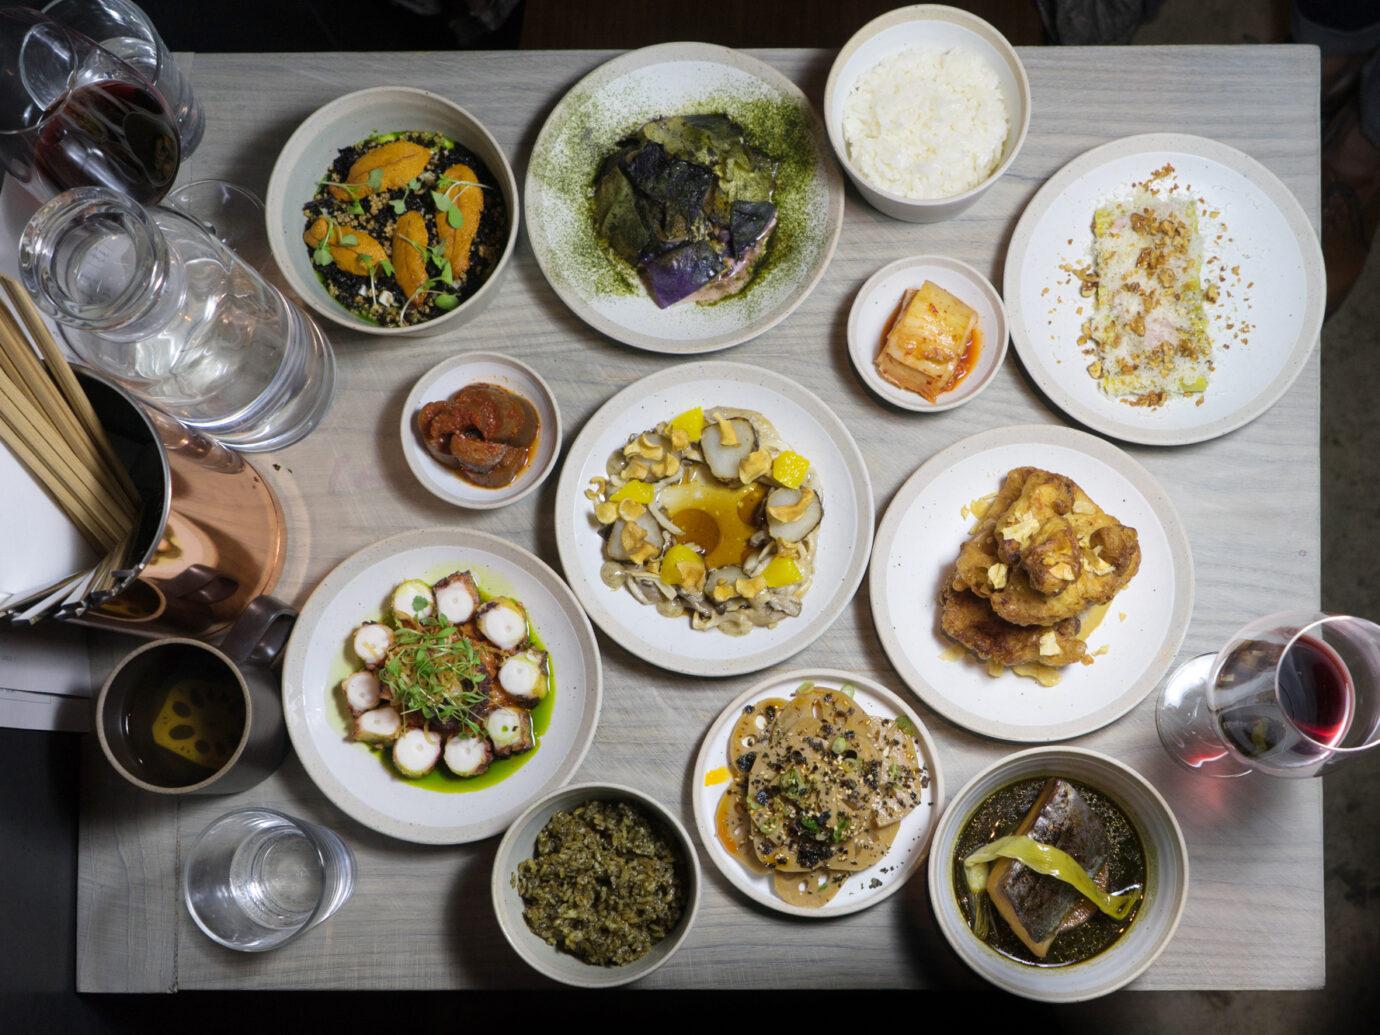 Food spread at Atoboy